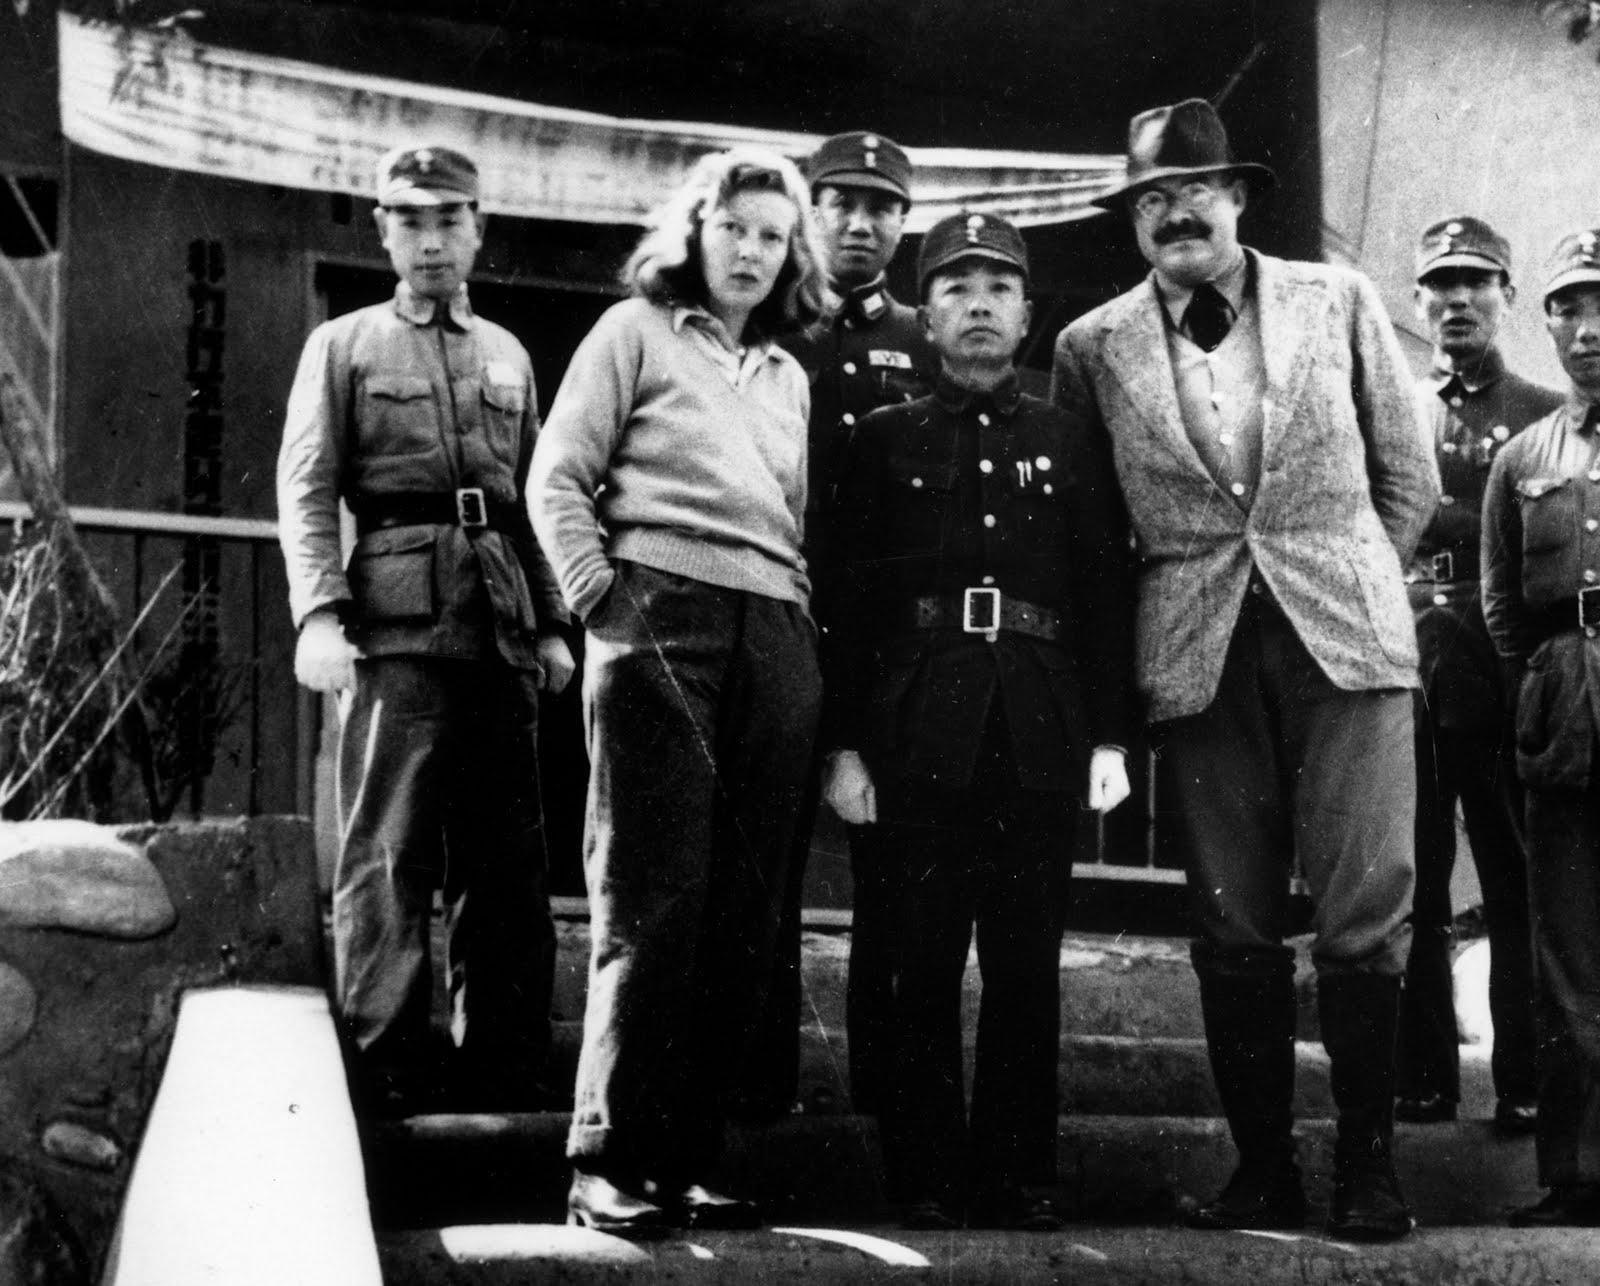 Updates, Live: An Upcoming Movie: Hemingway & Gellhorn